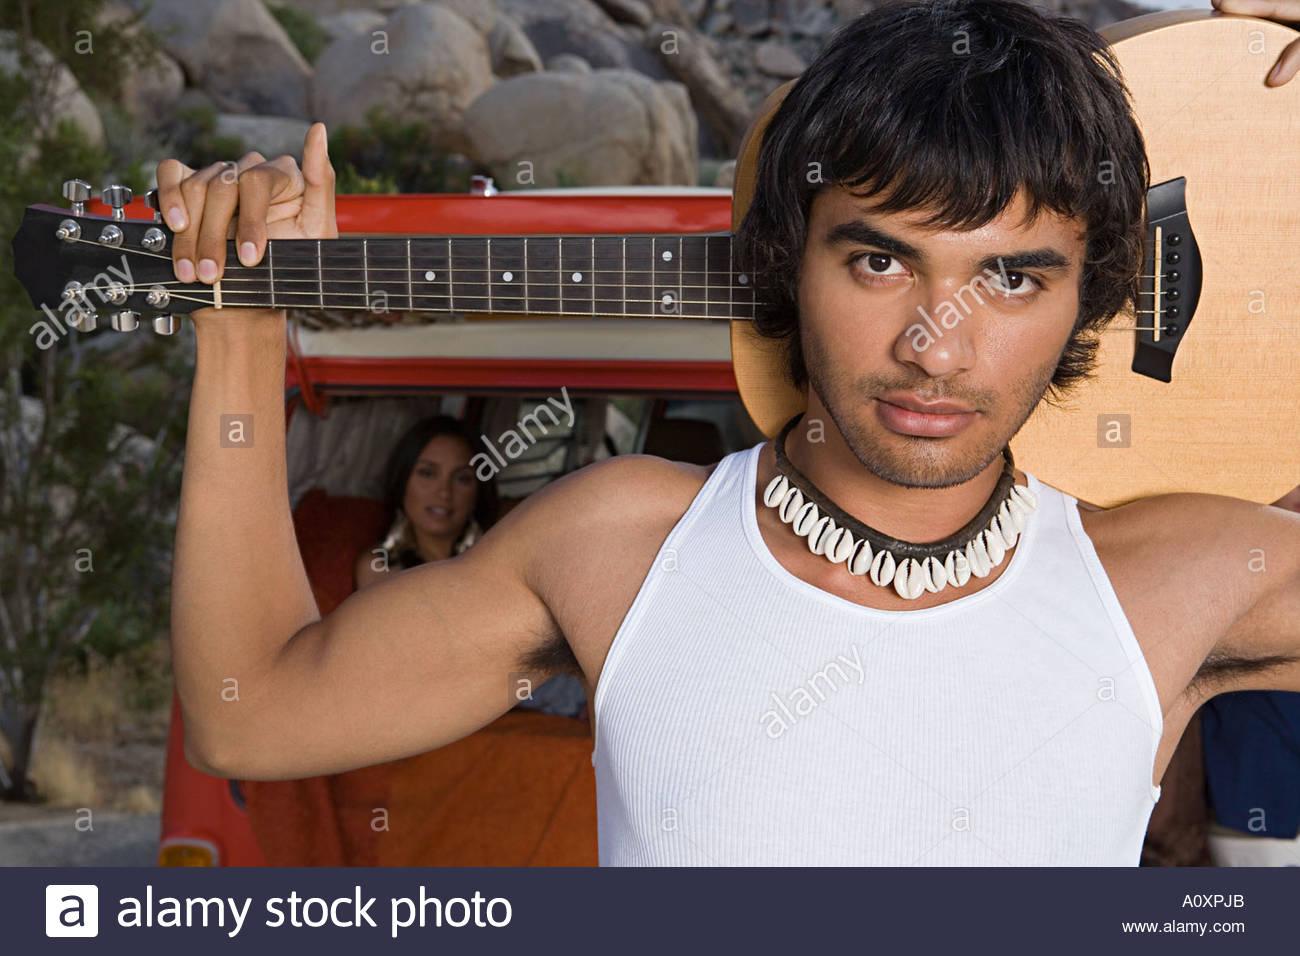 Young man carrying guitar - Stock Image